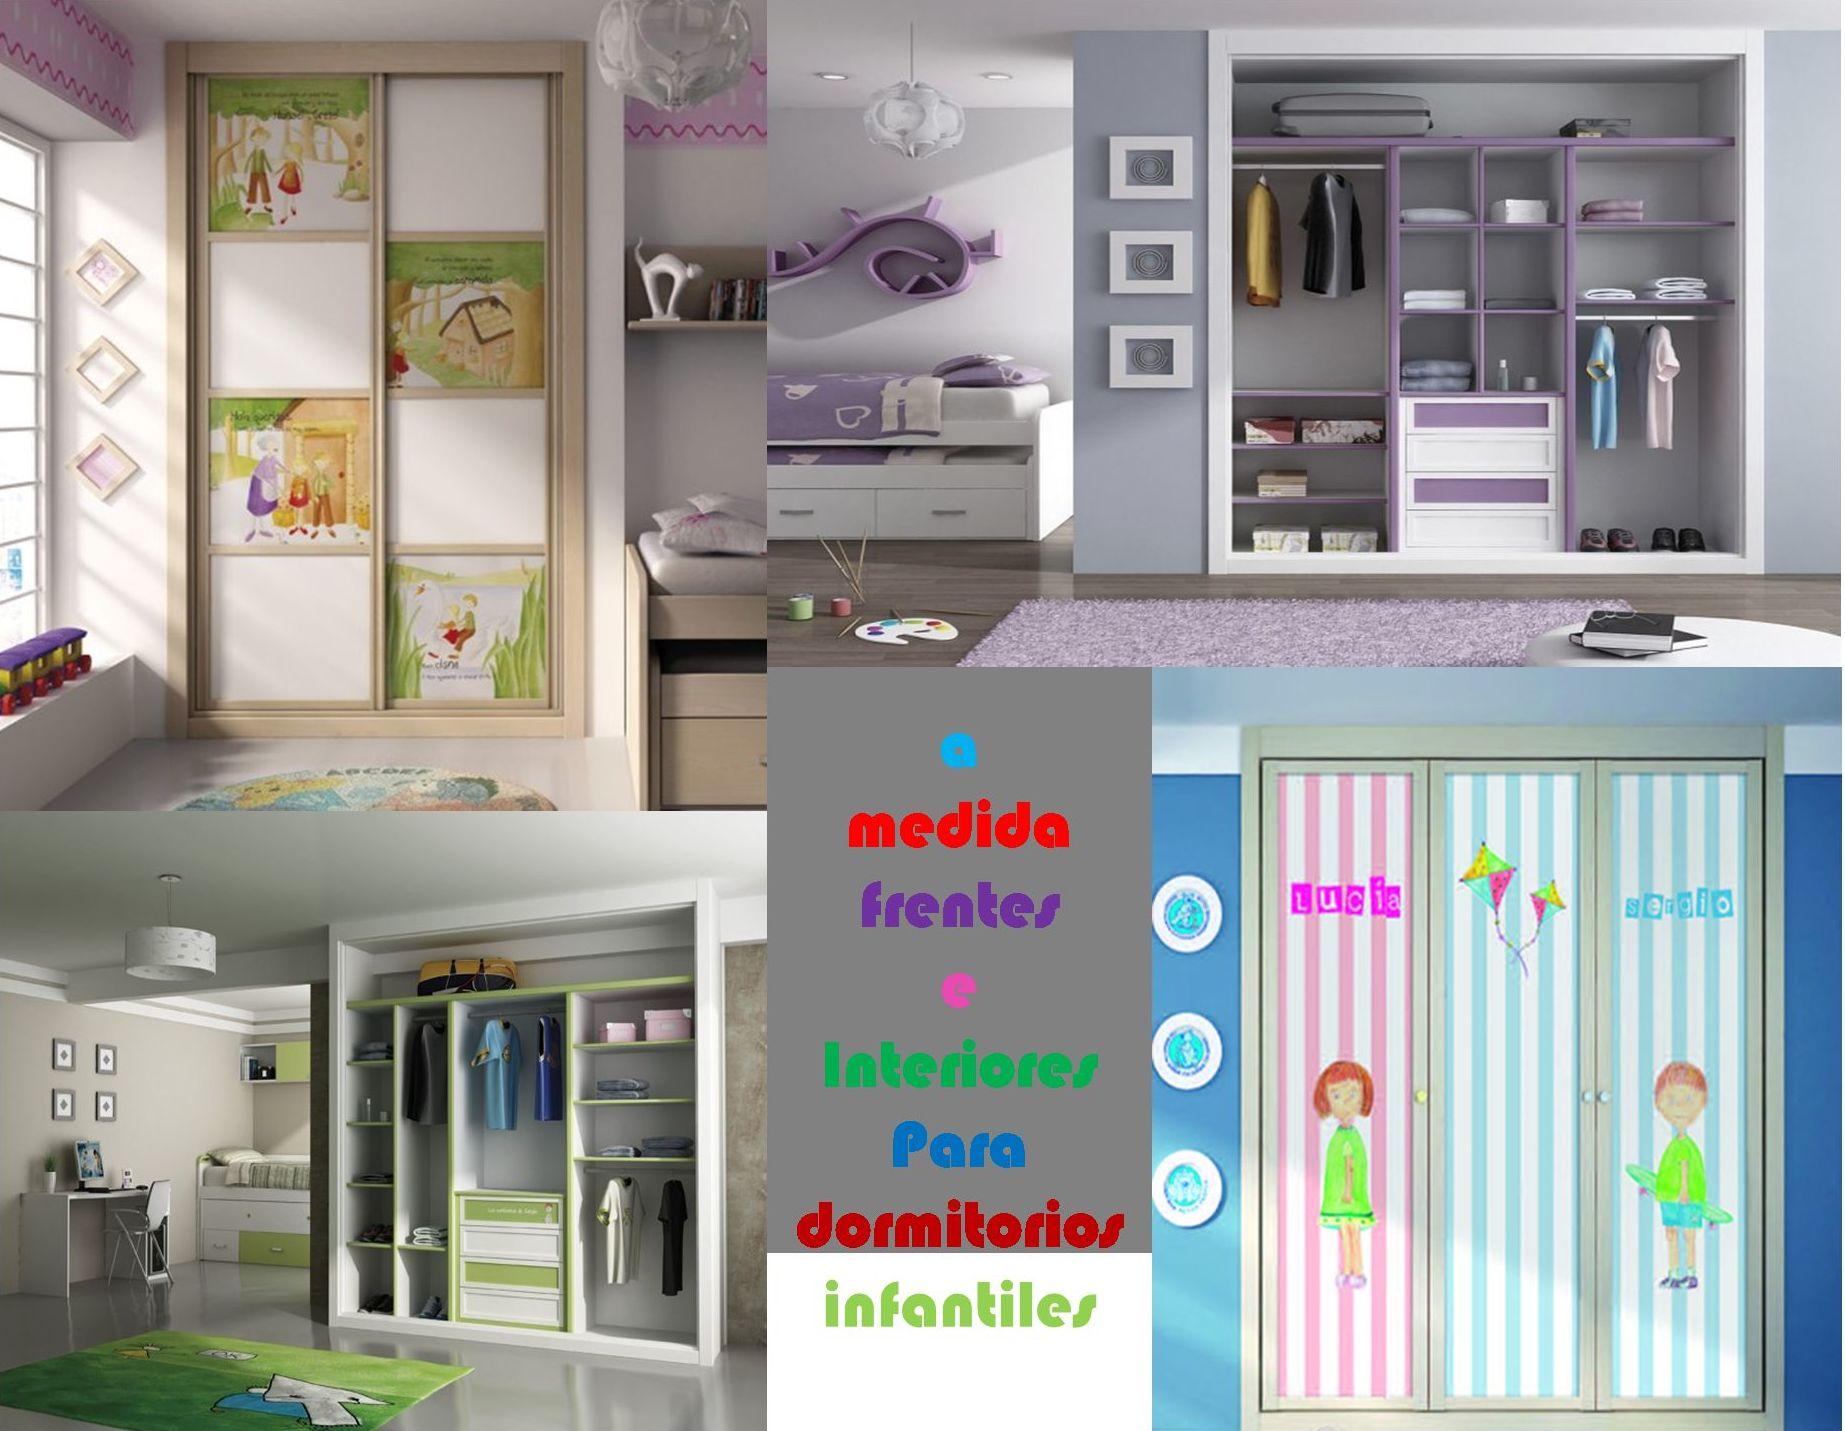 Frentes de armarios e interiores a medida: Servicios de DekoraStylo